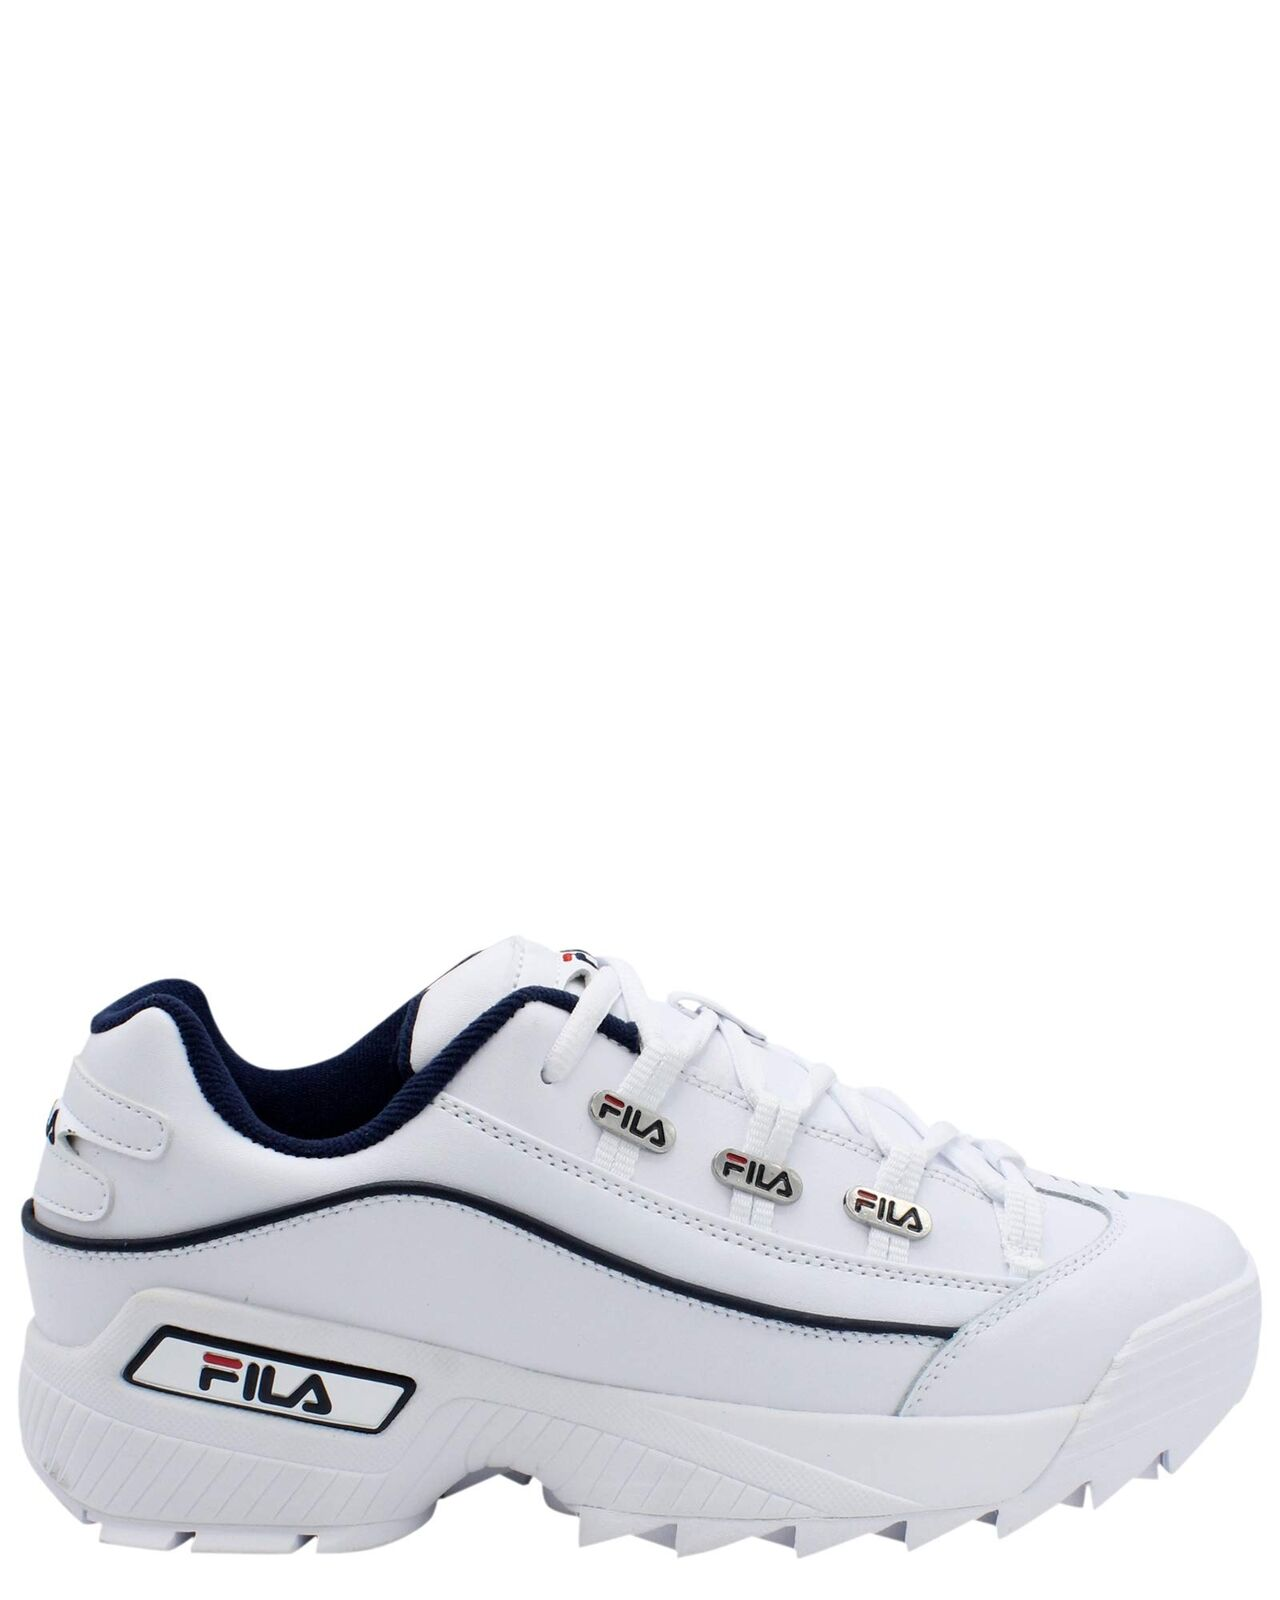 Fila 1CM00408-125  Zapatillas para hombre Hometown blancoooo Azul Marino Rojo